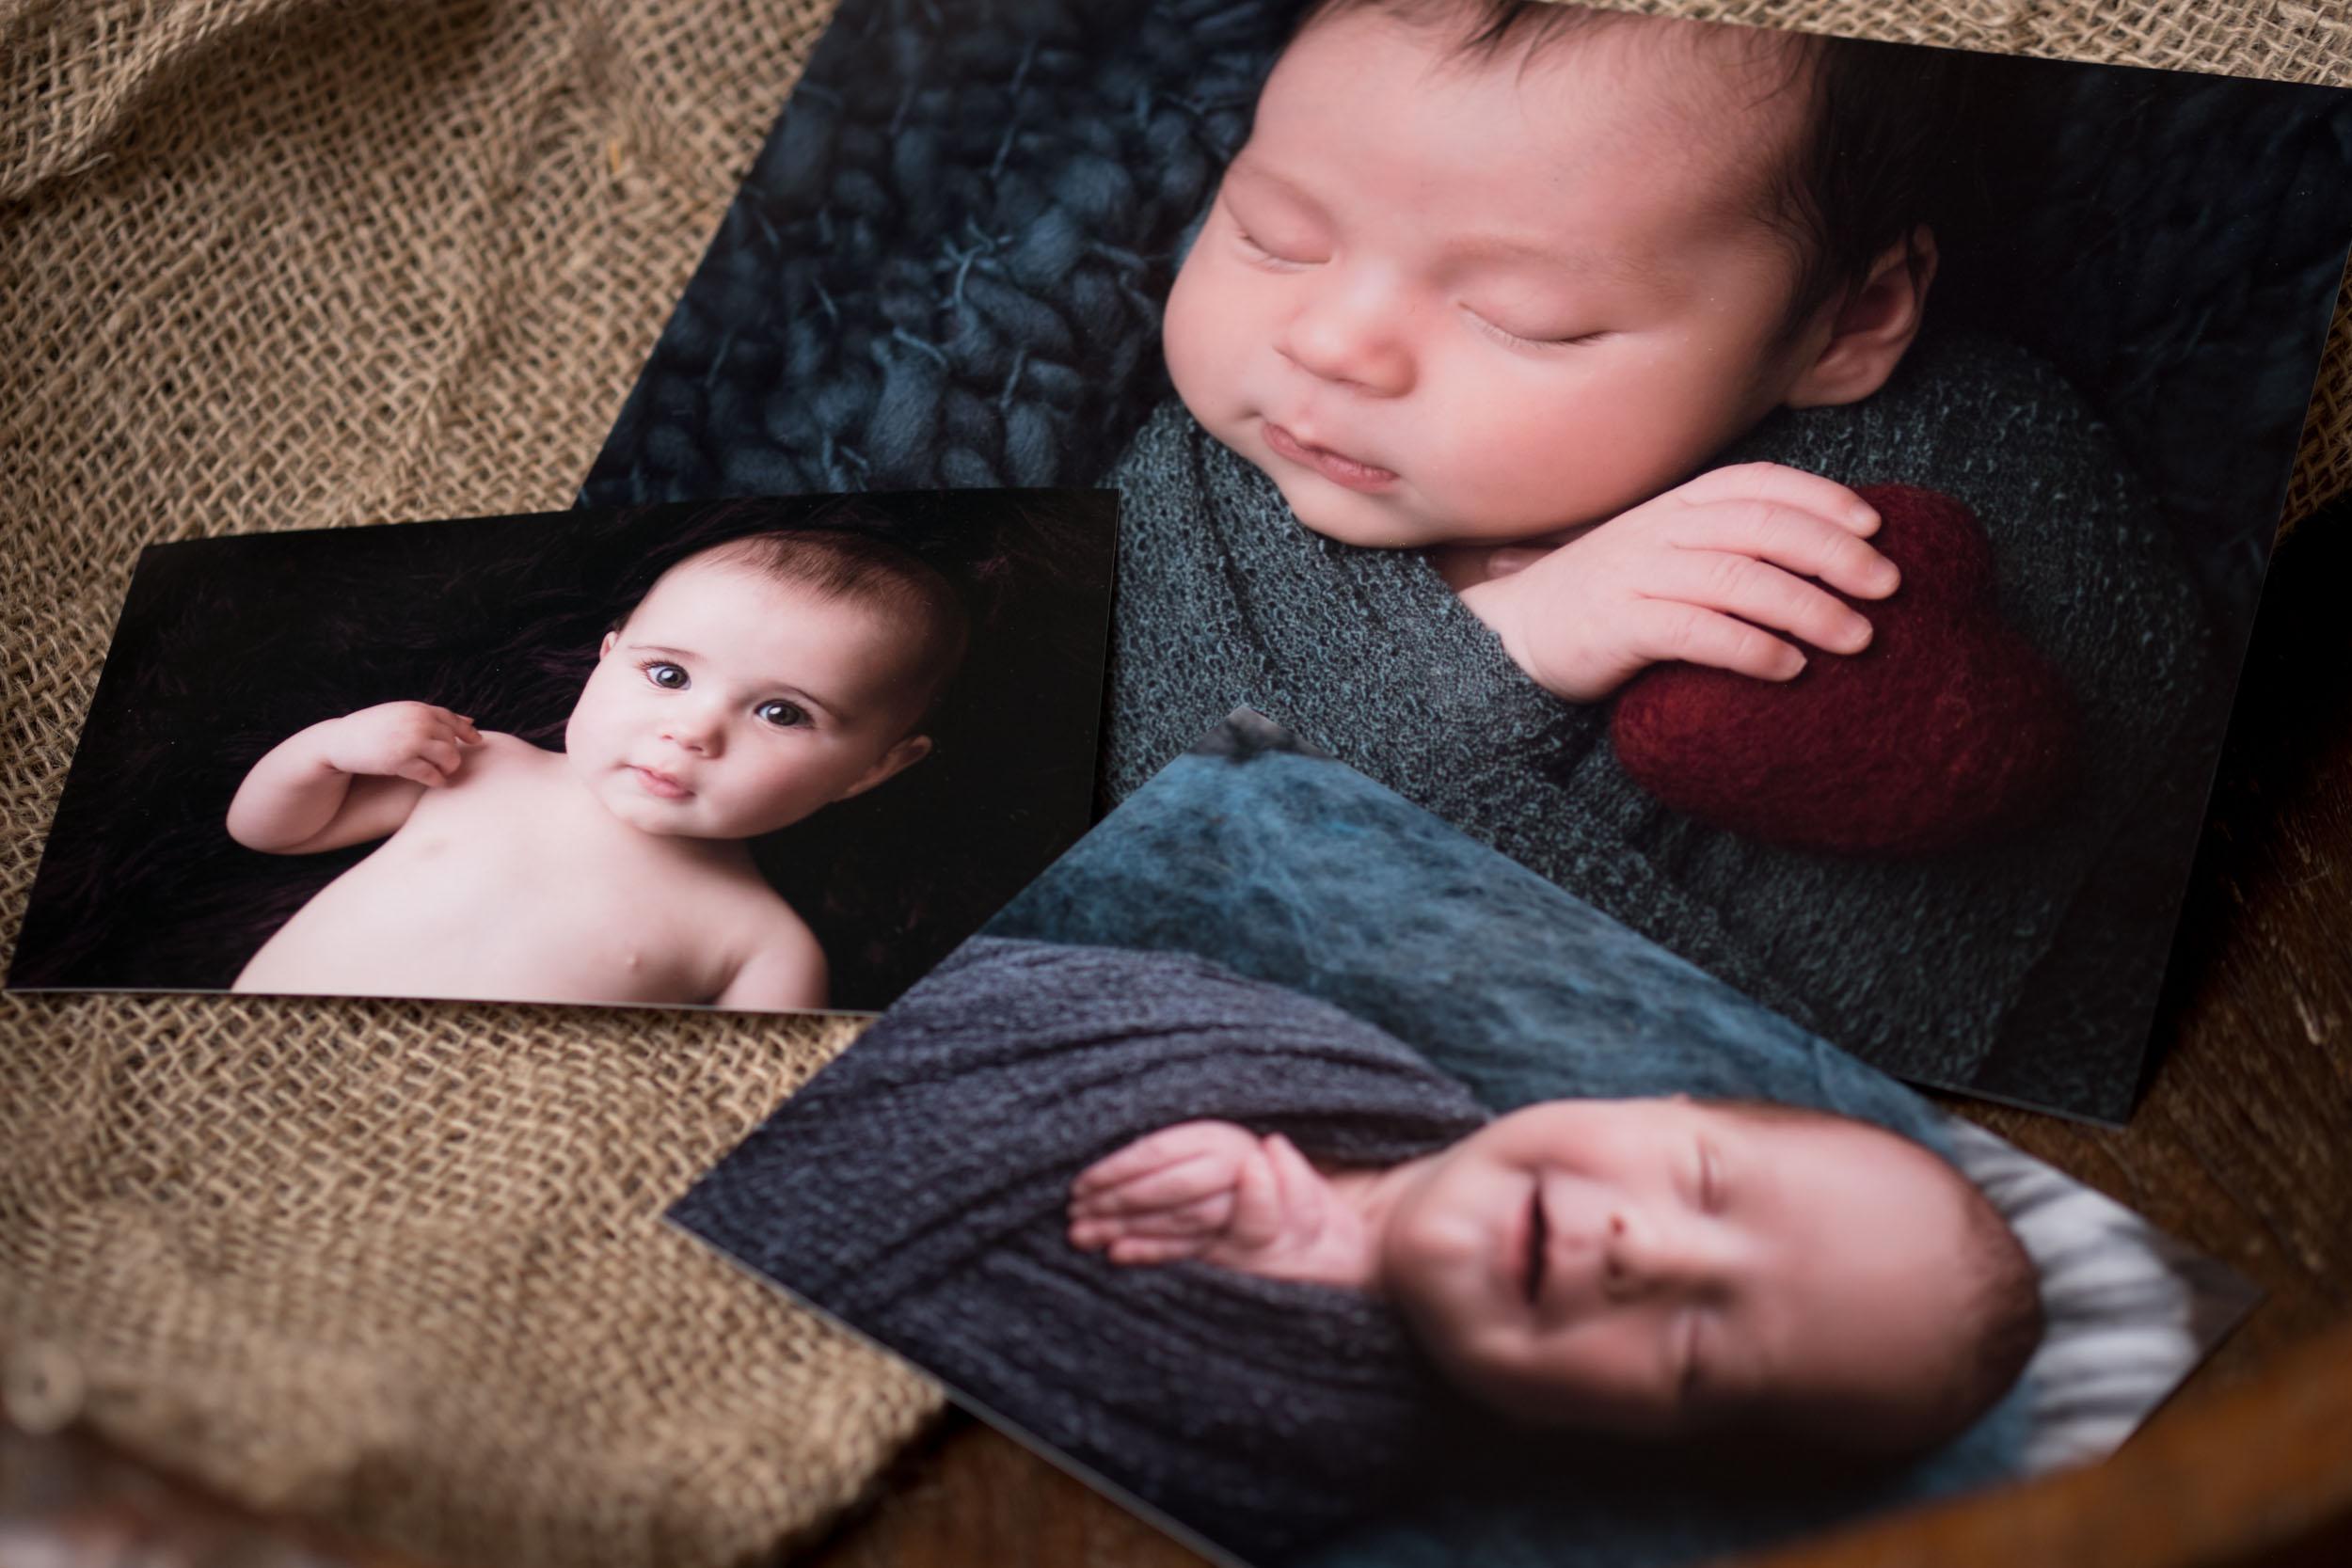 Newborn-Photography-Lincoln-Prints-003.jpg